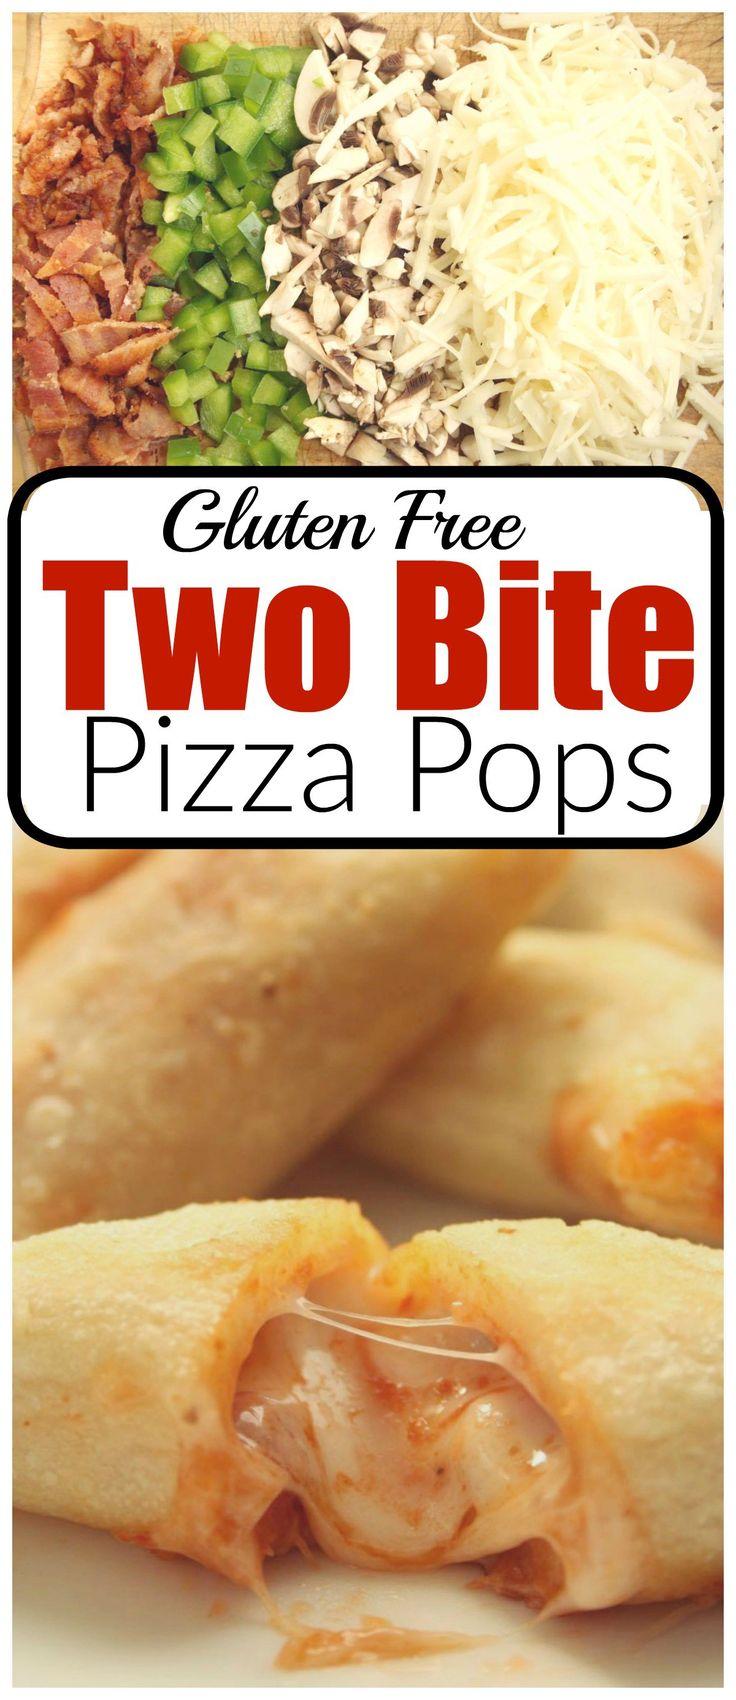 Two Bite Pizza Pops Gluten Free